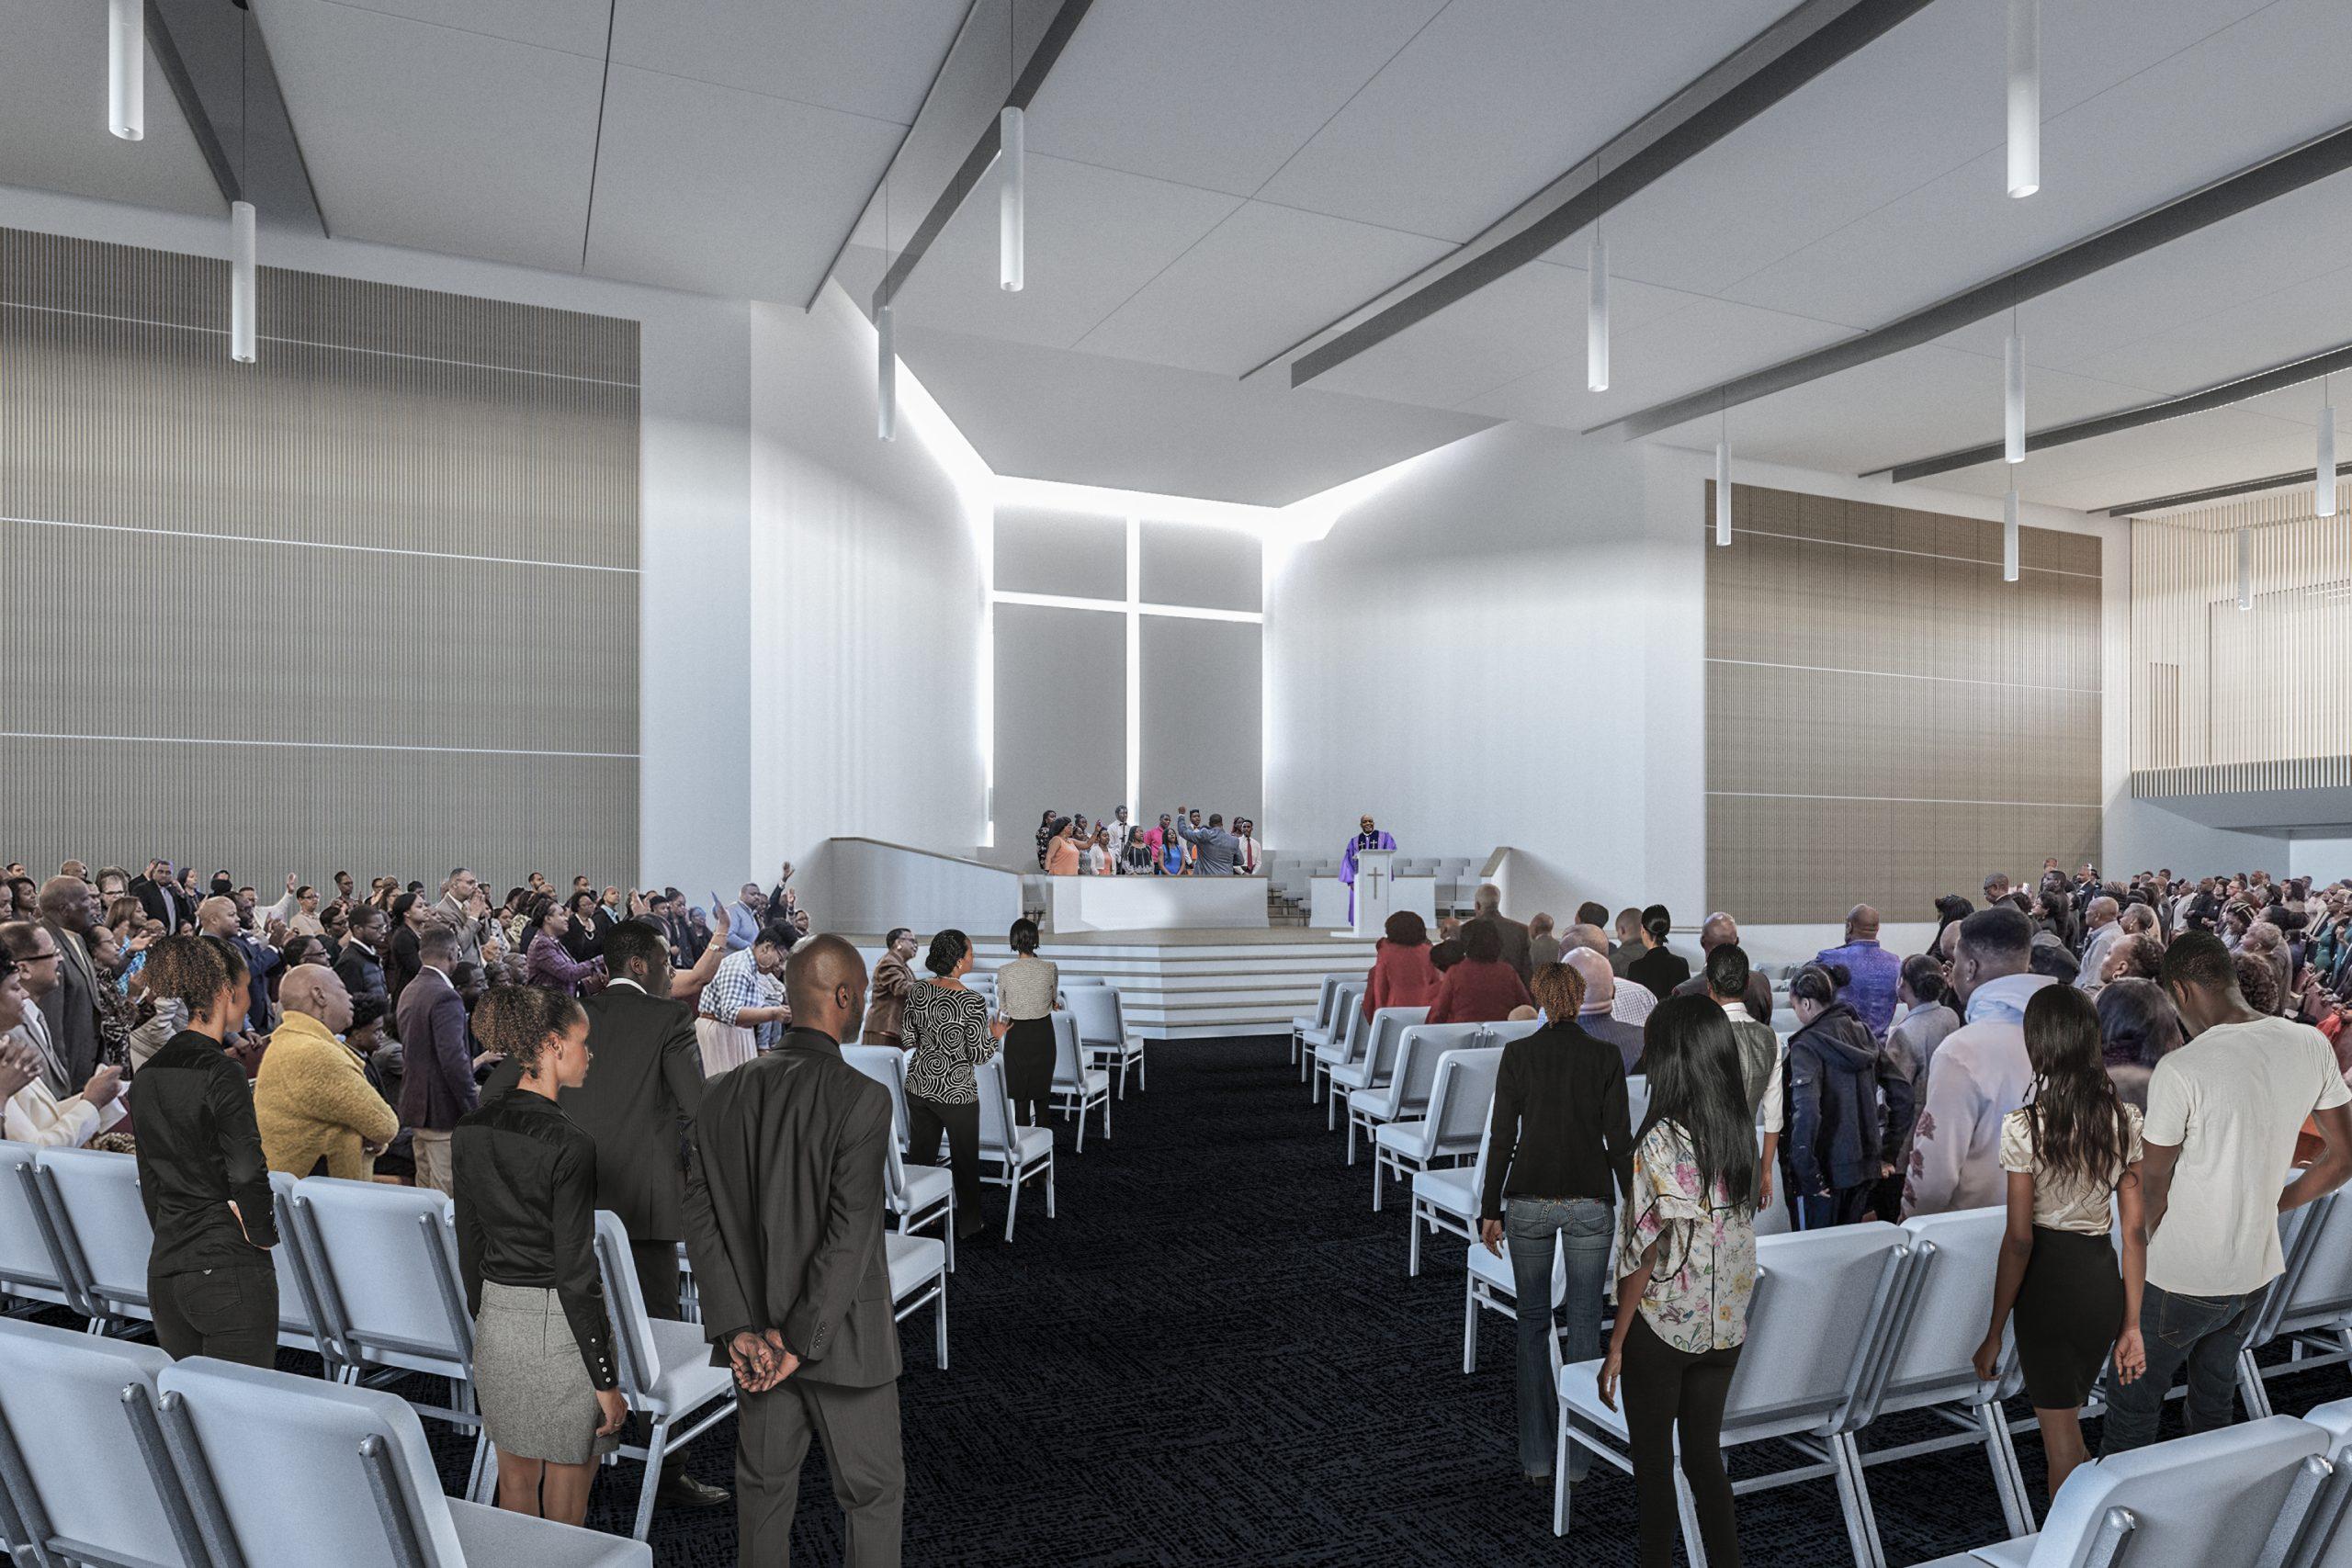 Watts Chapel Missionary Baptist Church 016